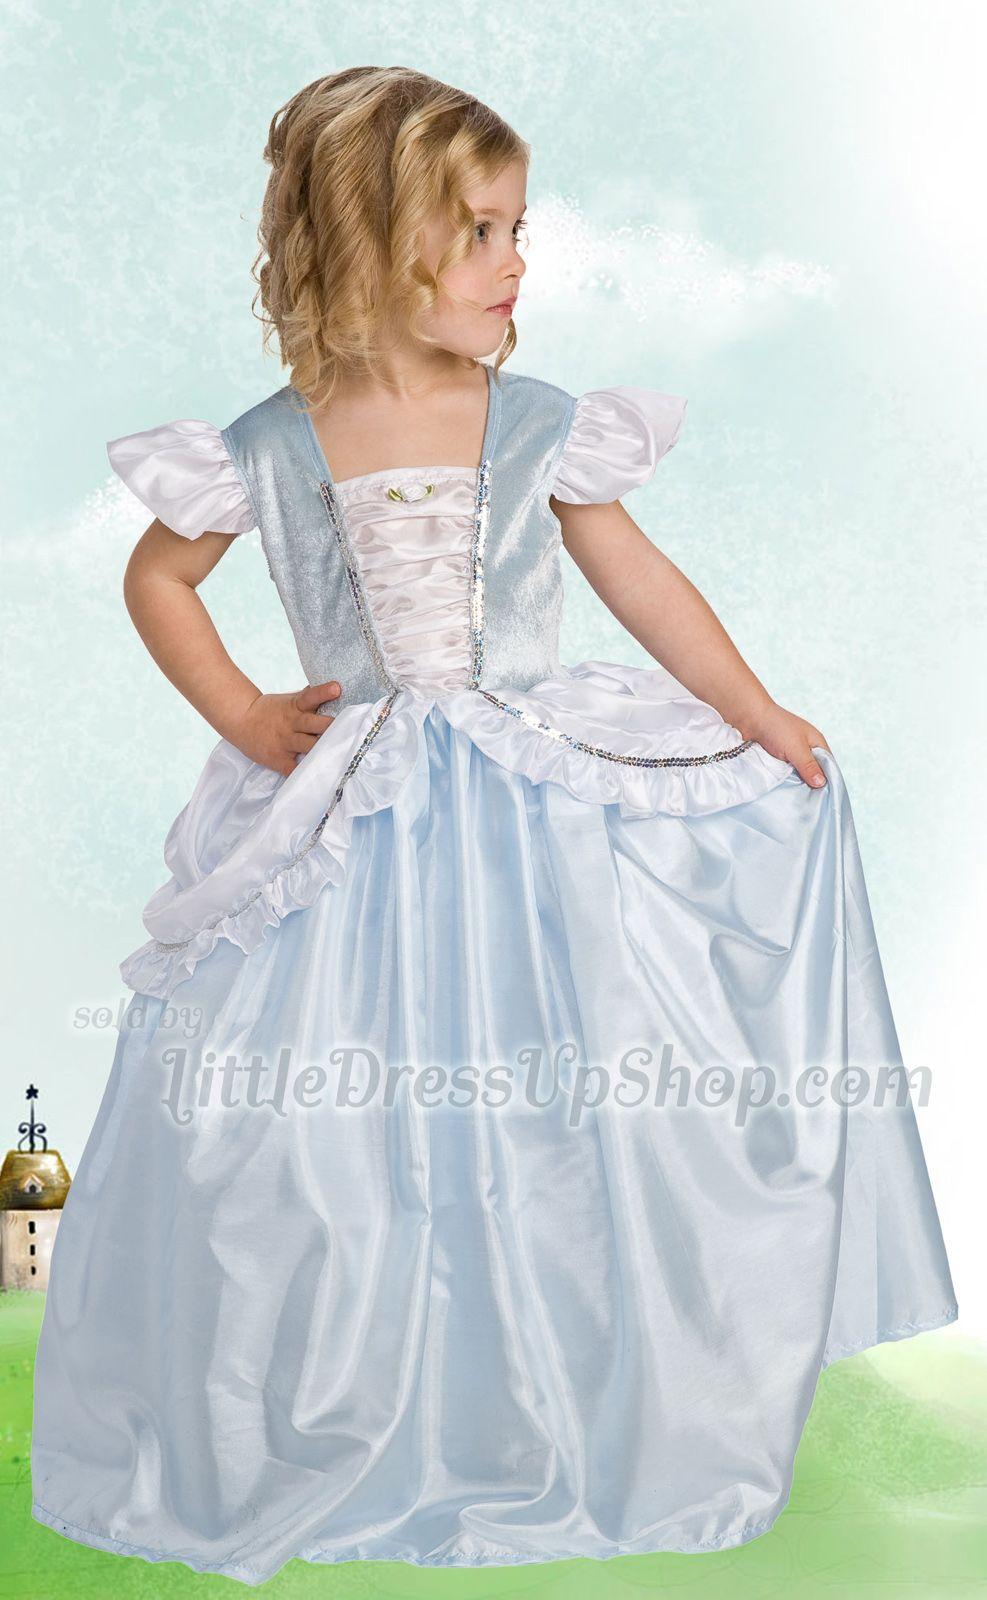 Cinderella Dress Up Costume   Cinderella dresses, Costumes and Princess